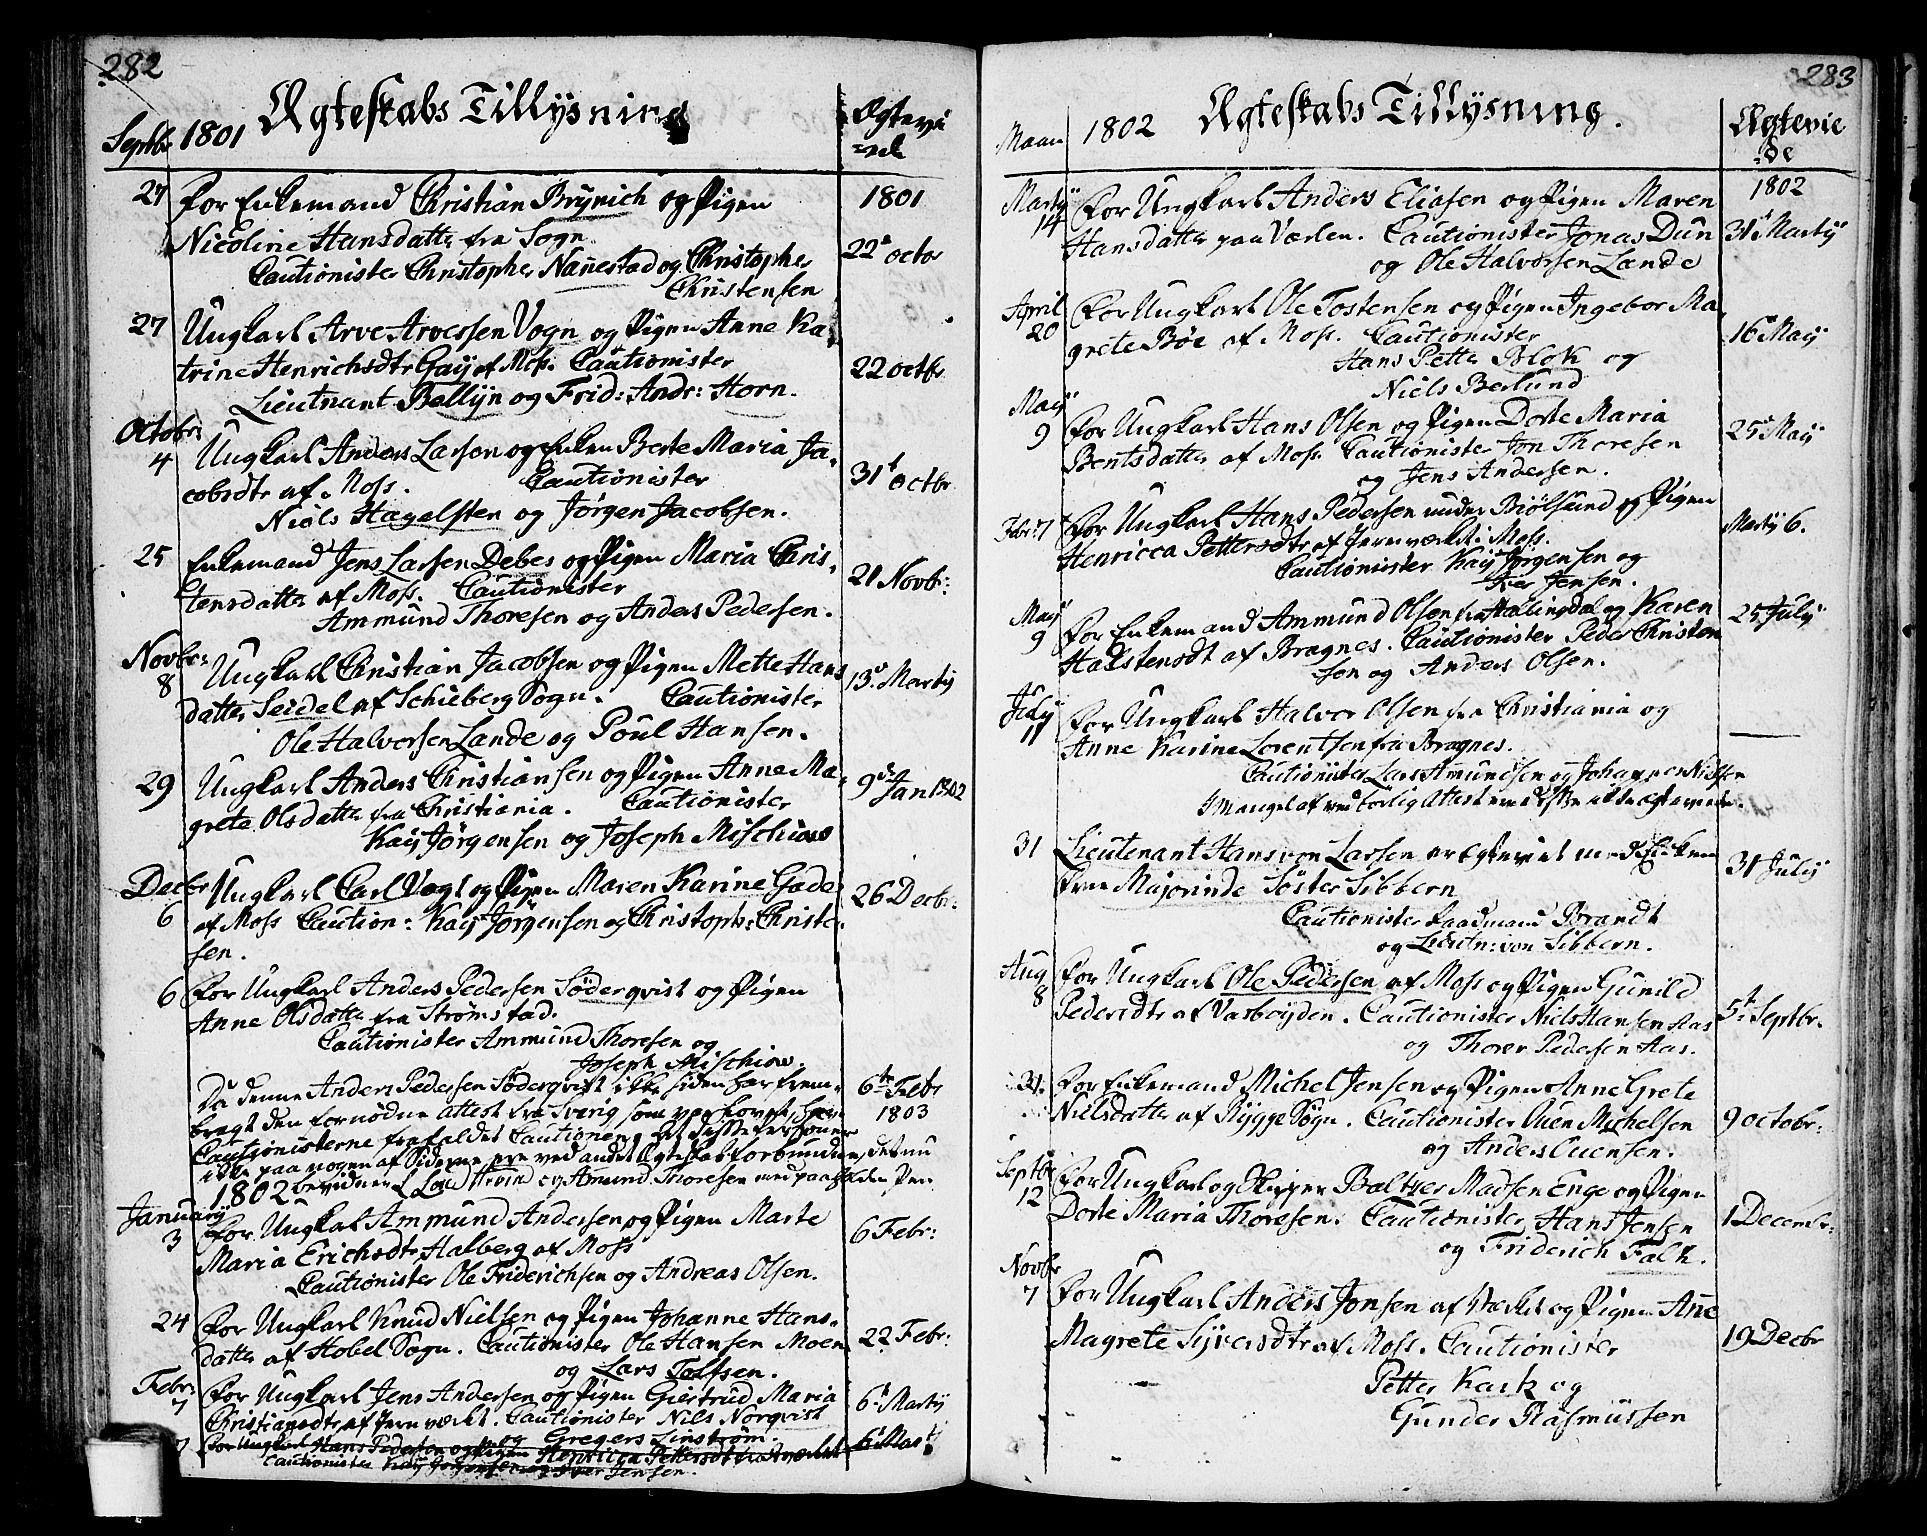 SAO, Moss prestekontor Kirkebøker, F/Fa/Faa/L0004: Ministerialbok nr. I 4, 1784-1808, s. 282-283